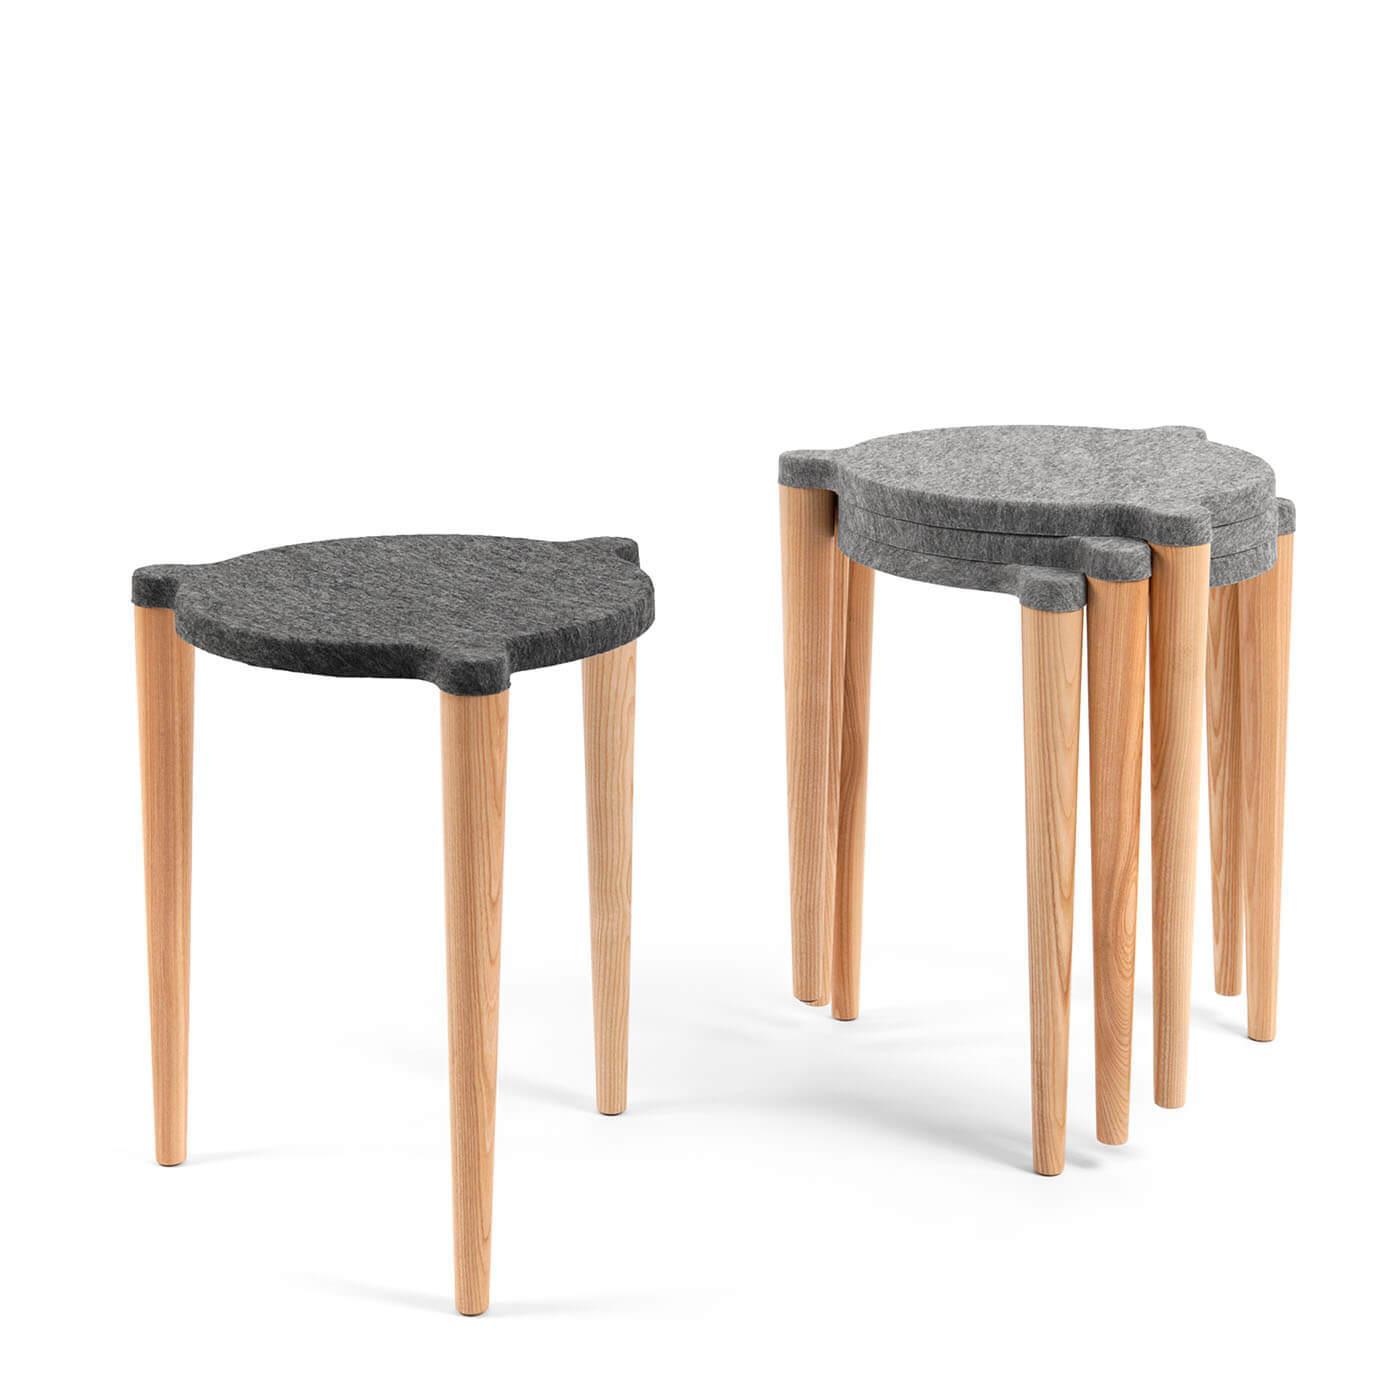 Holzhocker skandinavisches design jetzt online kaufen for Hocker stapelbar